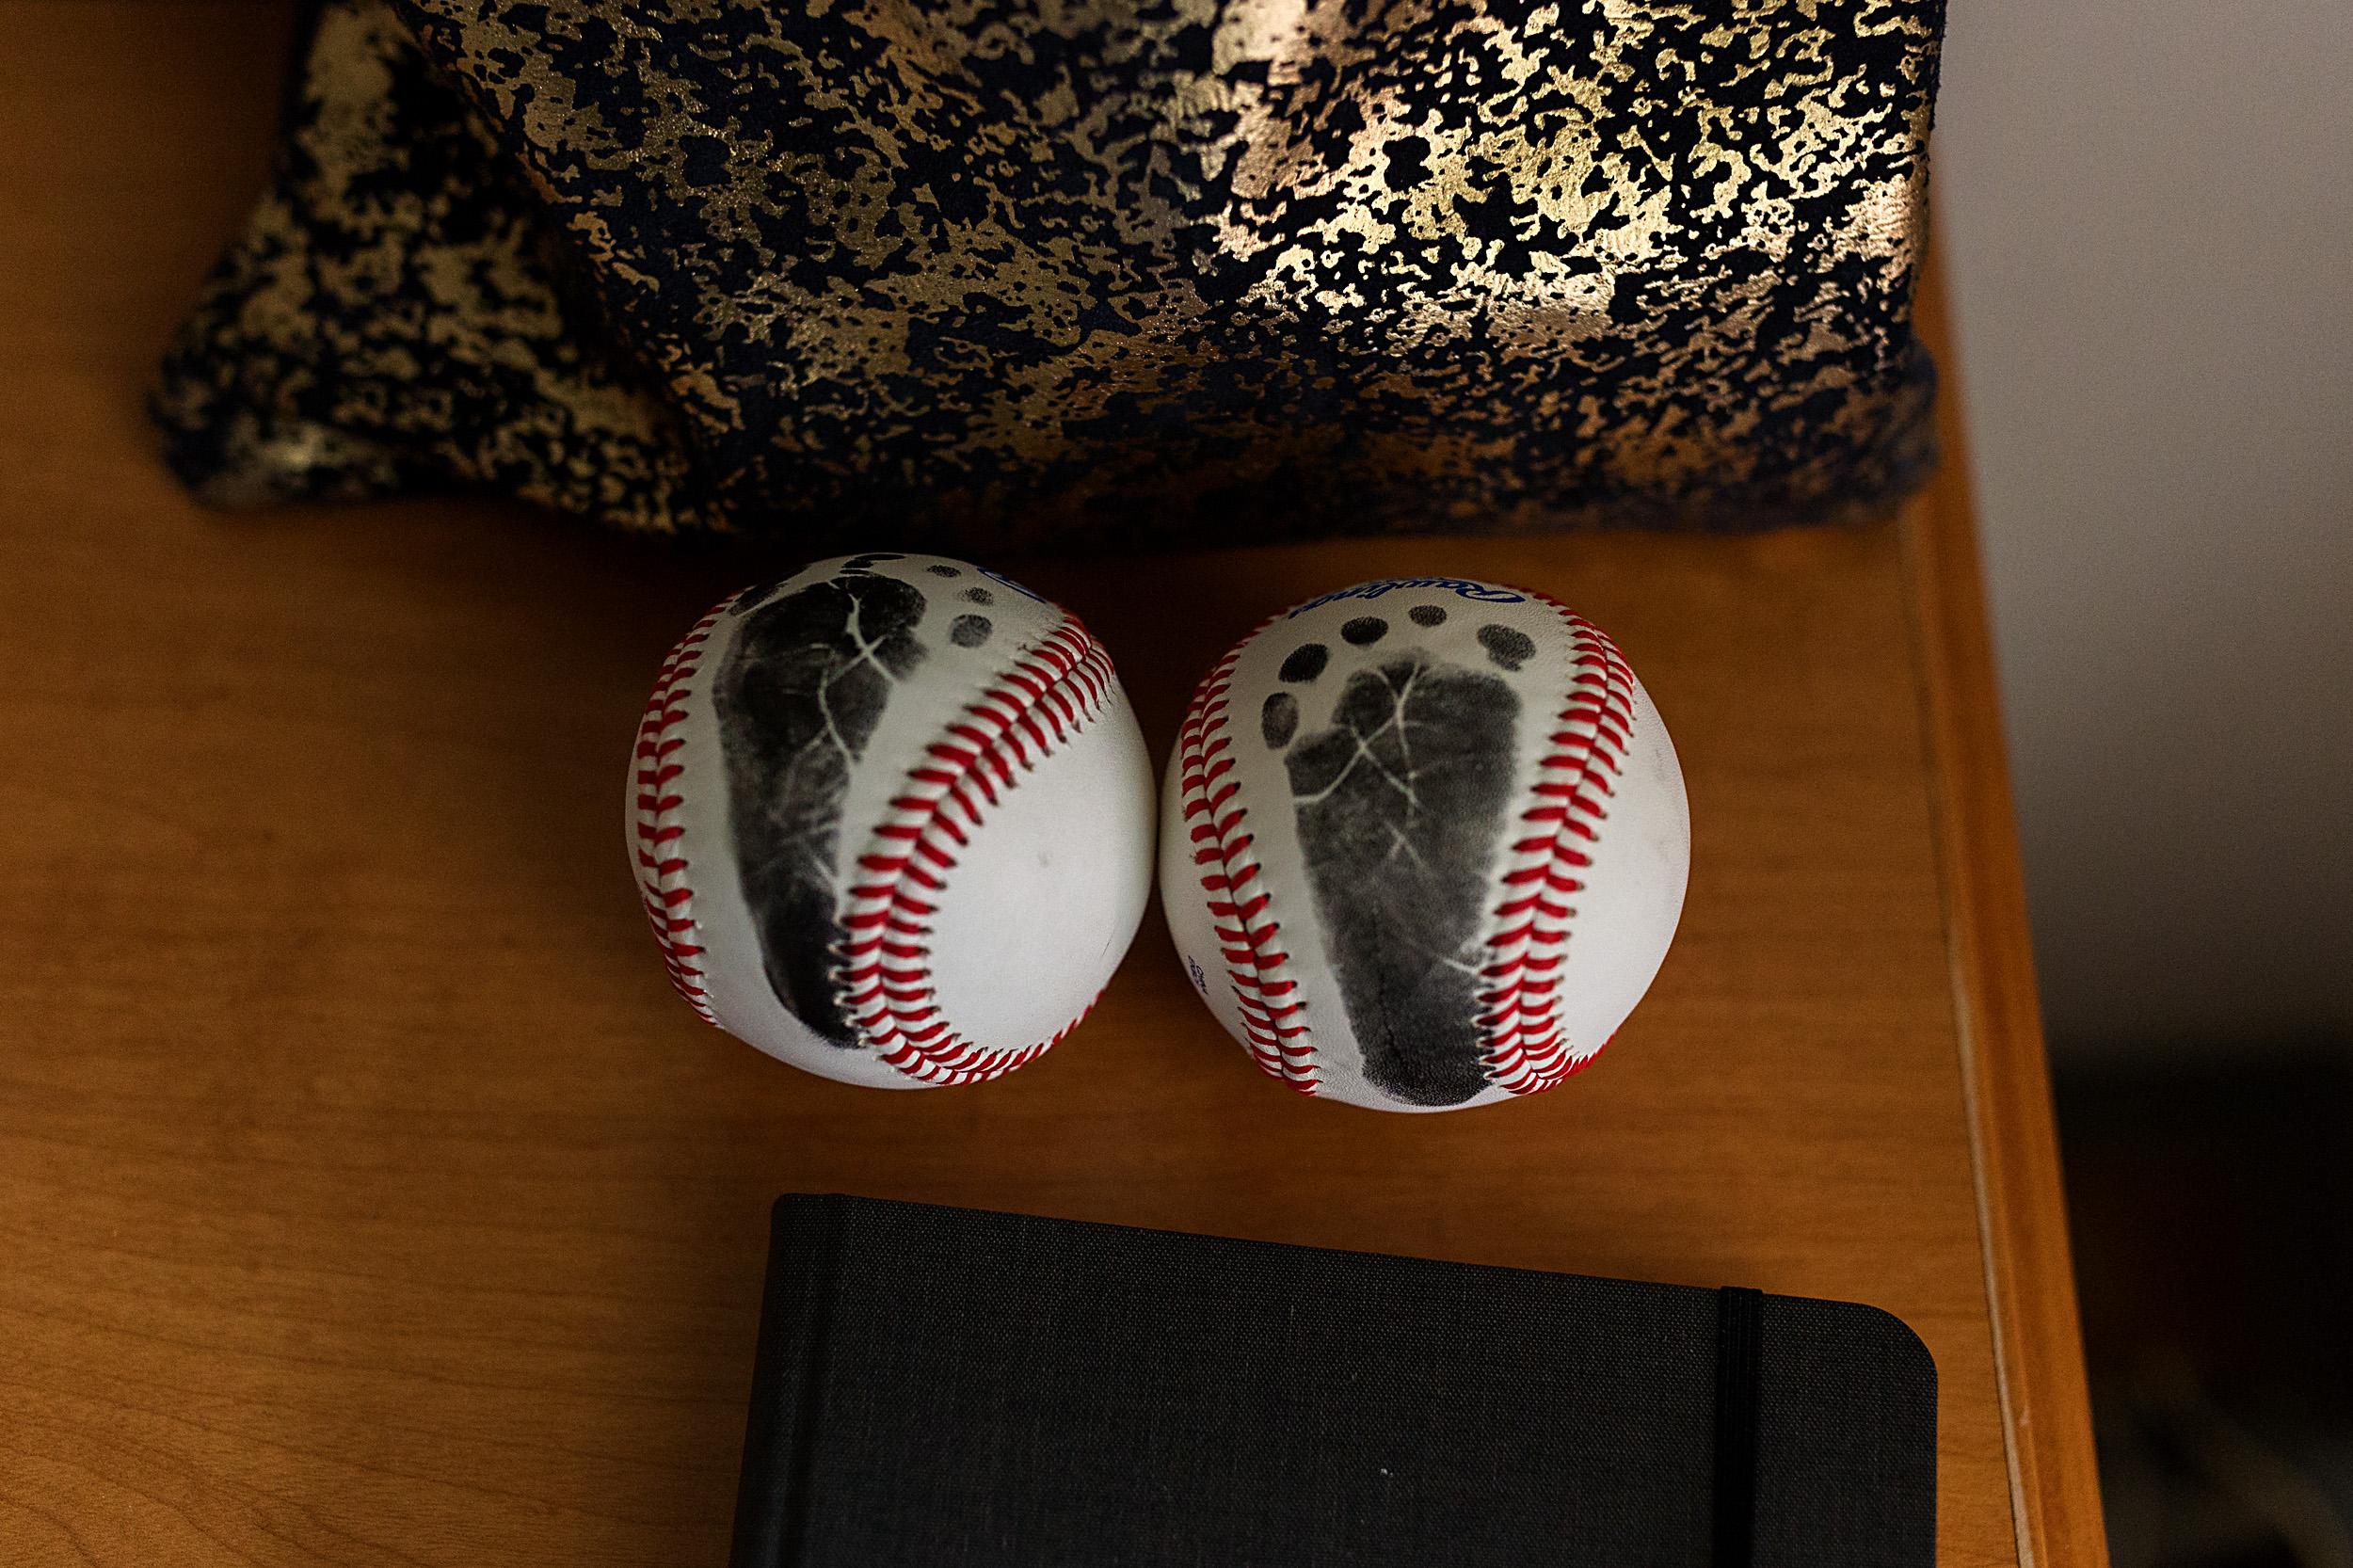 footprints on baseballs for each of dad's boys